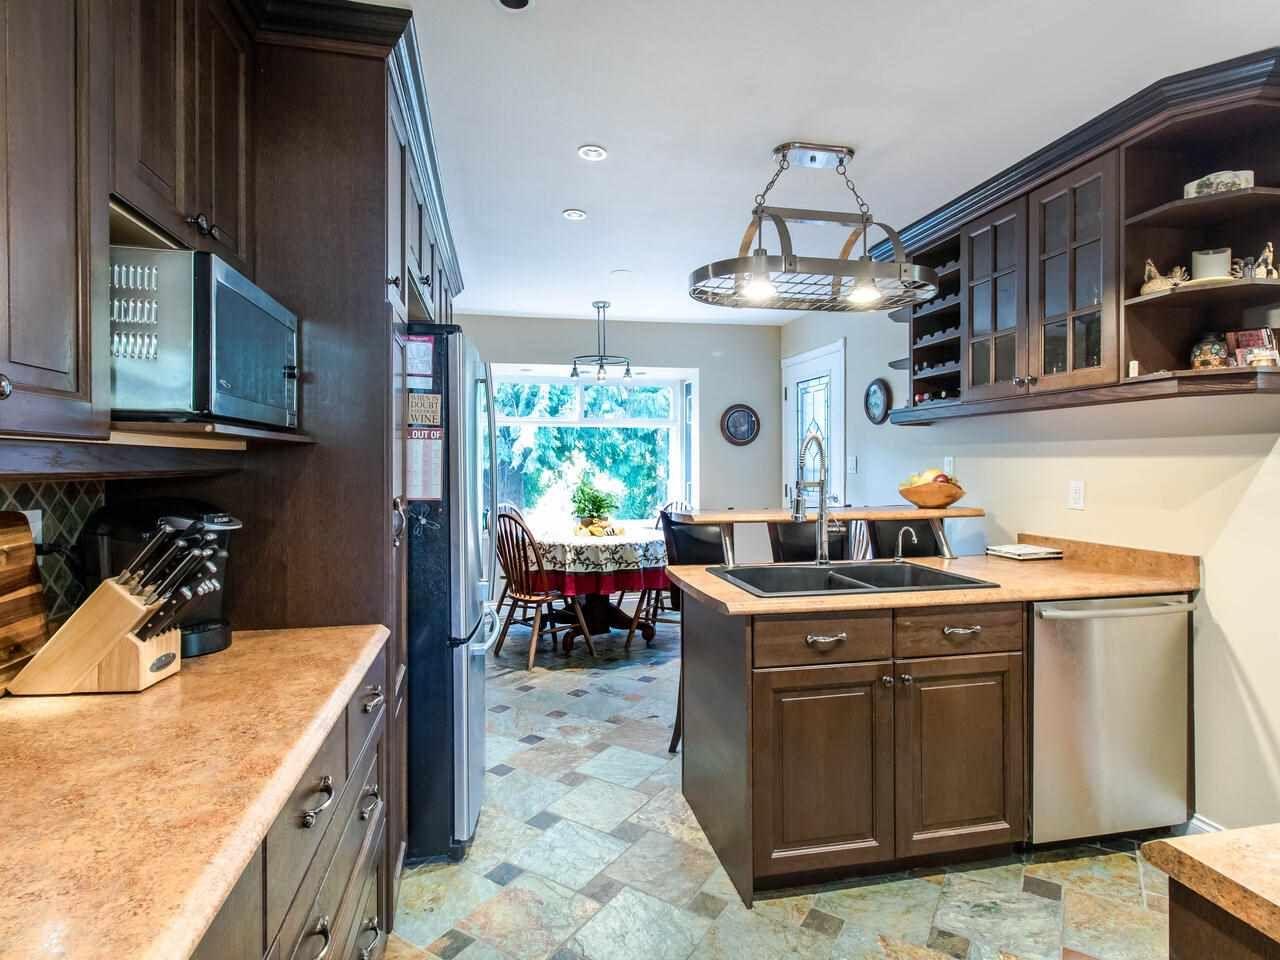 Photo 3: Photos: 11505 PEMBERTON Crescent in Delta: Annieville House for sale (N. Delta)  : MLS®# R2512135